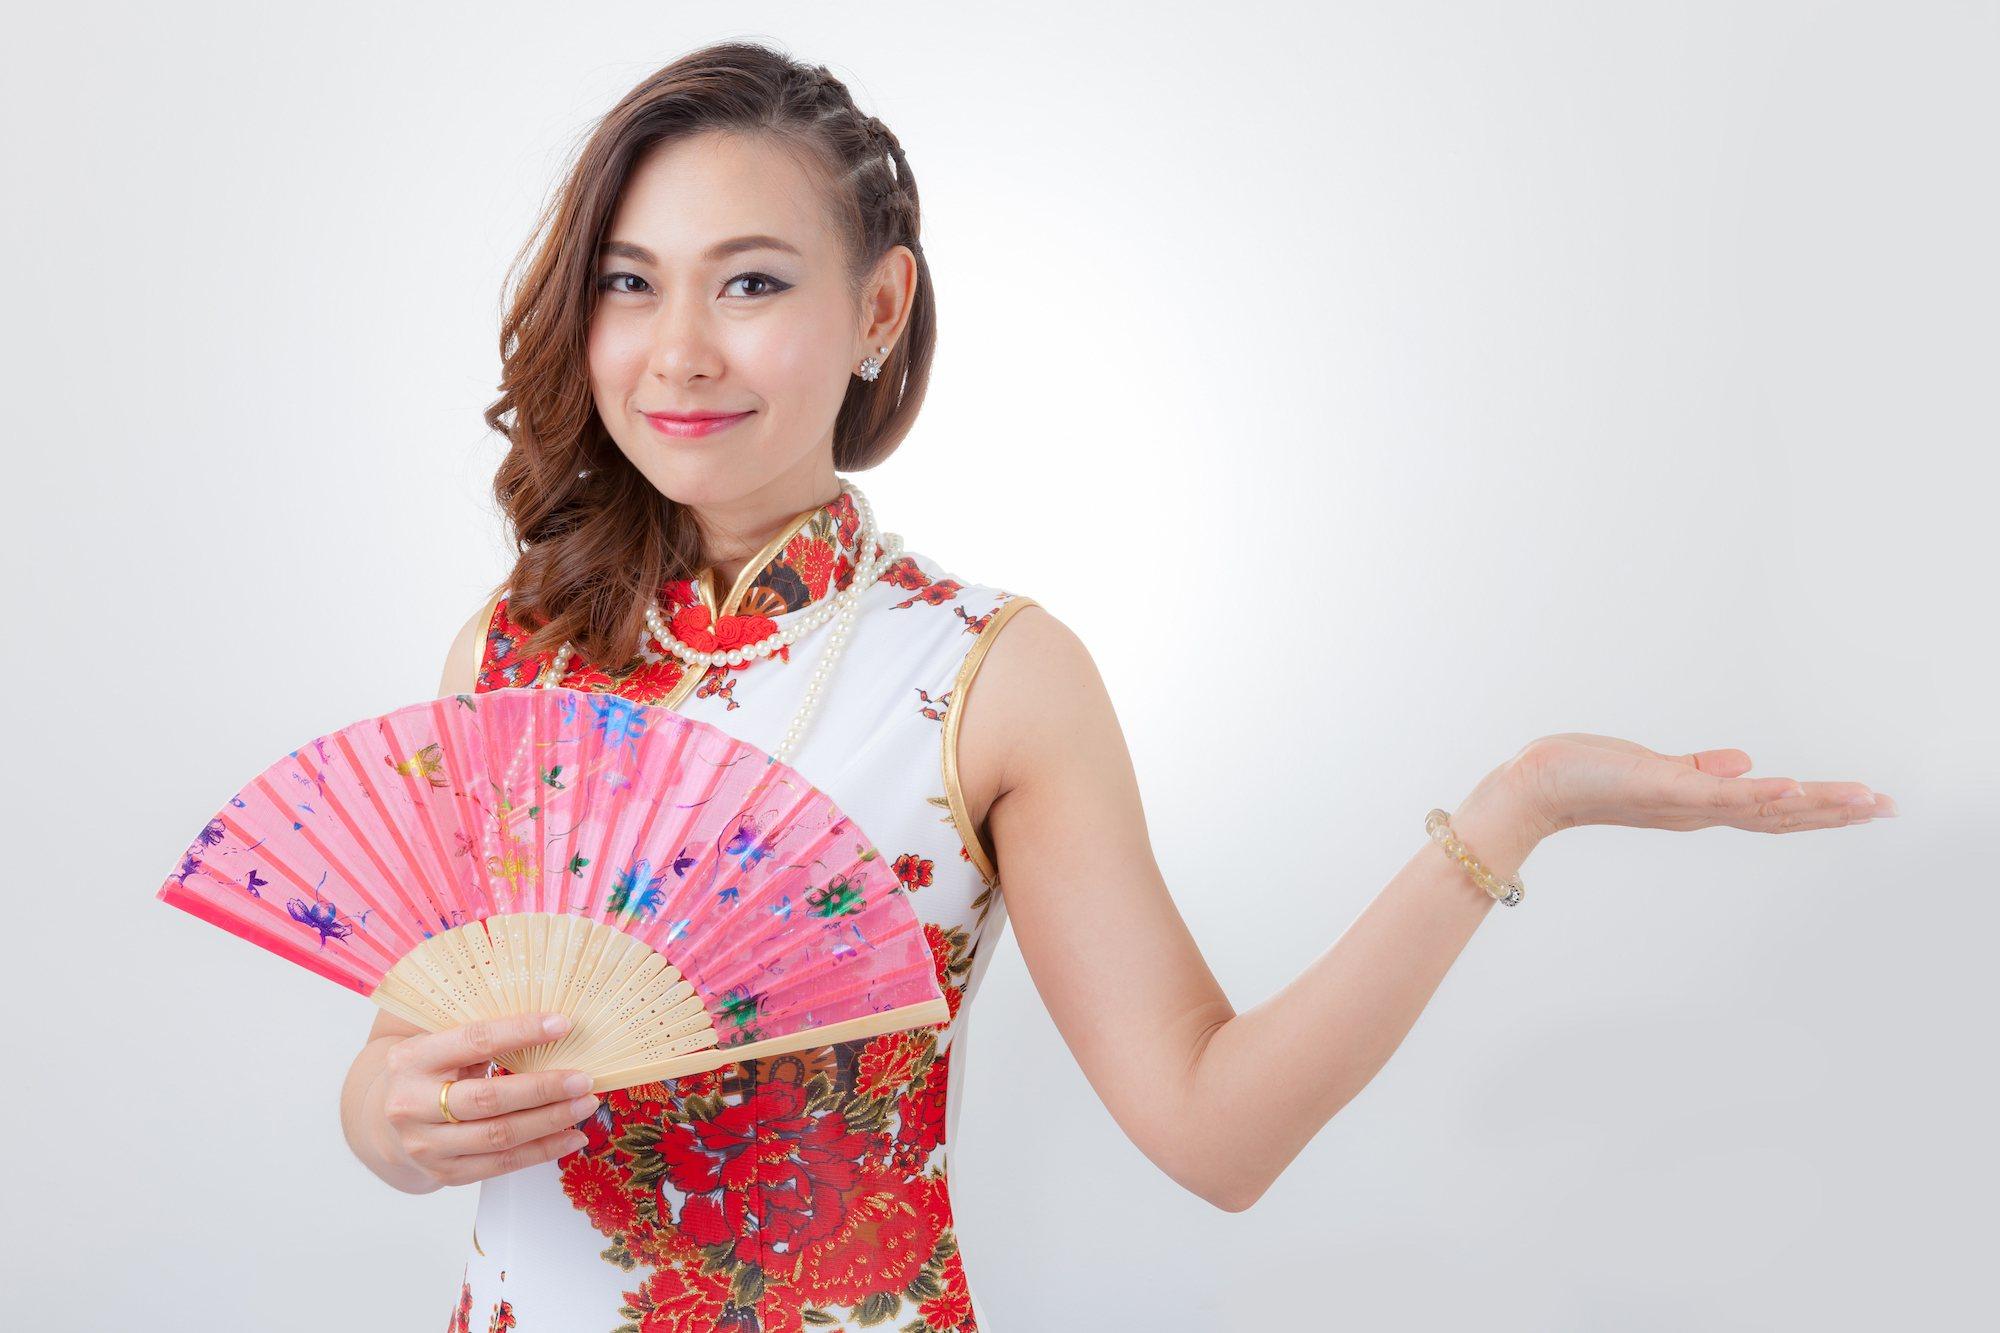 Gaya rambut Imlek Tahun Baru Cina 2018 - side braid.